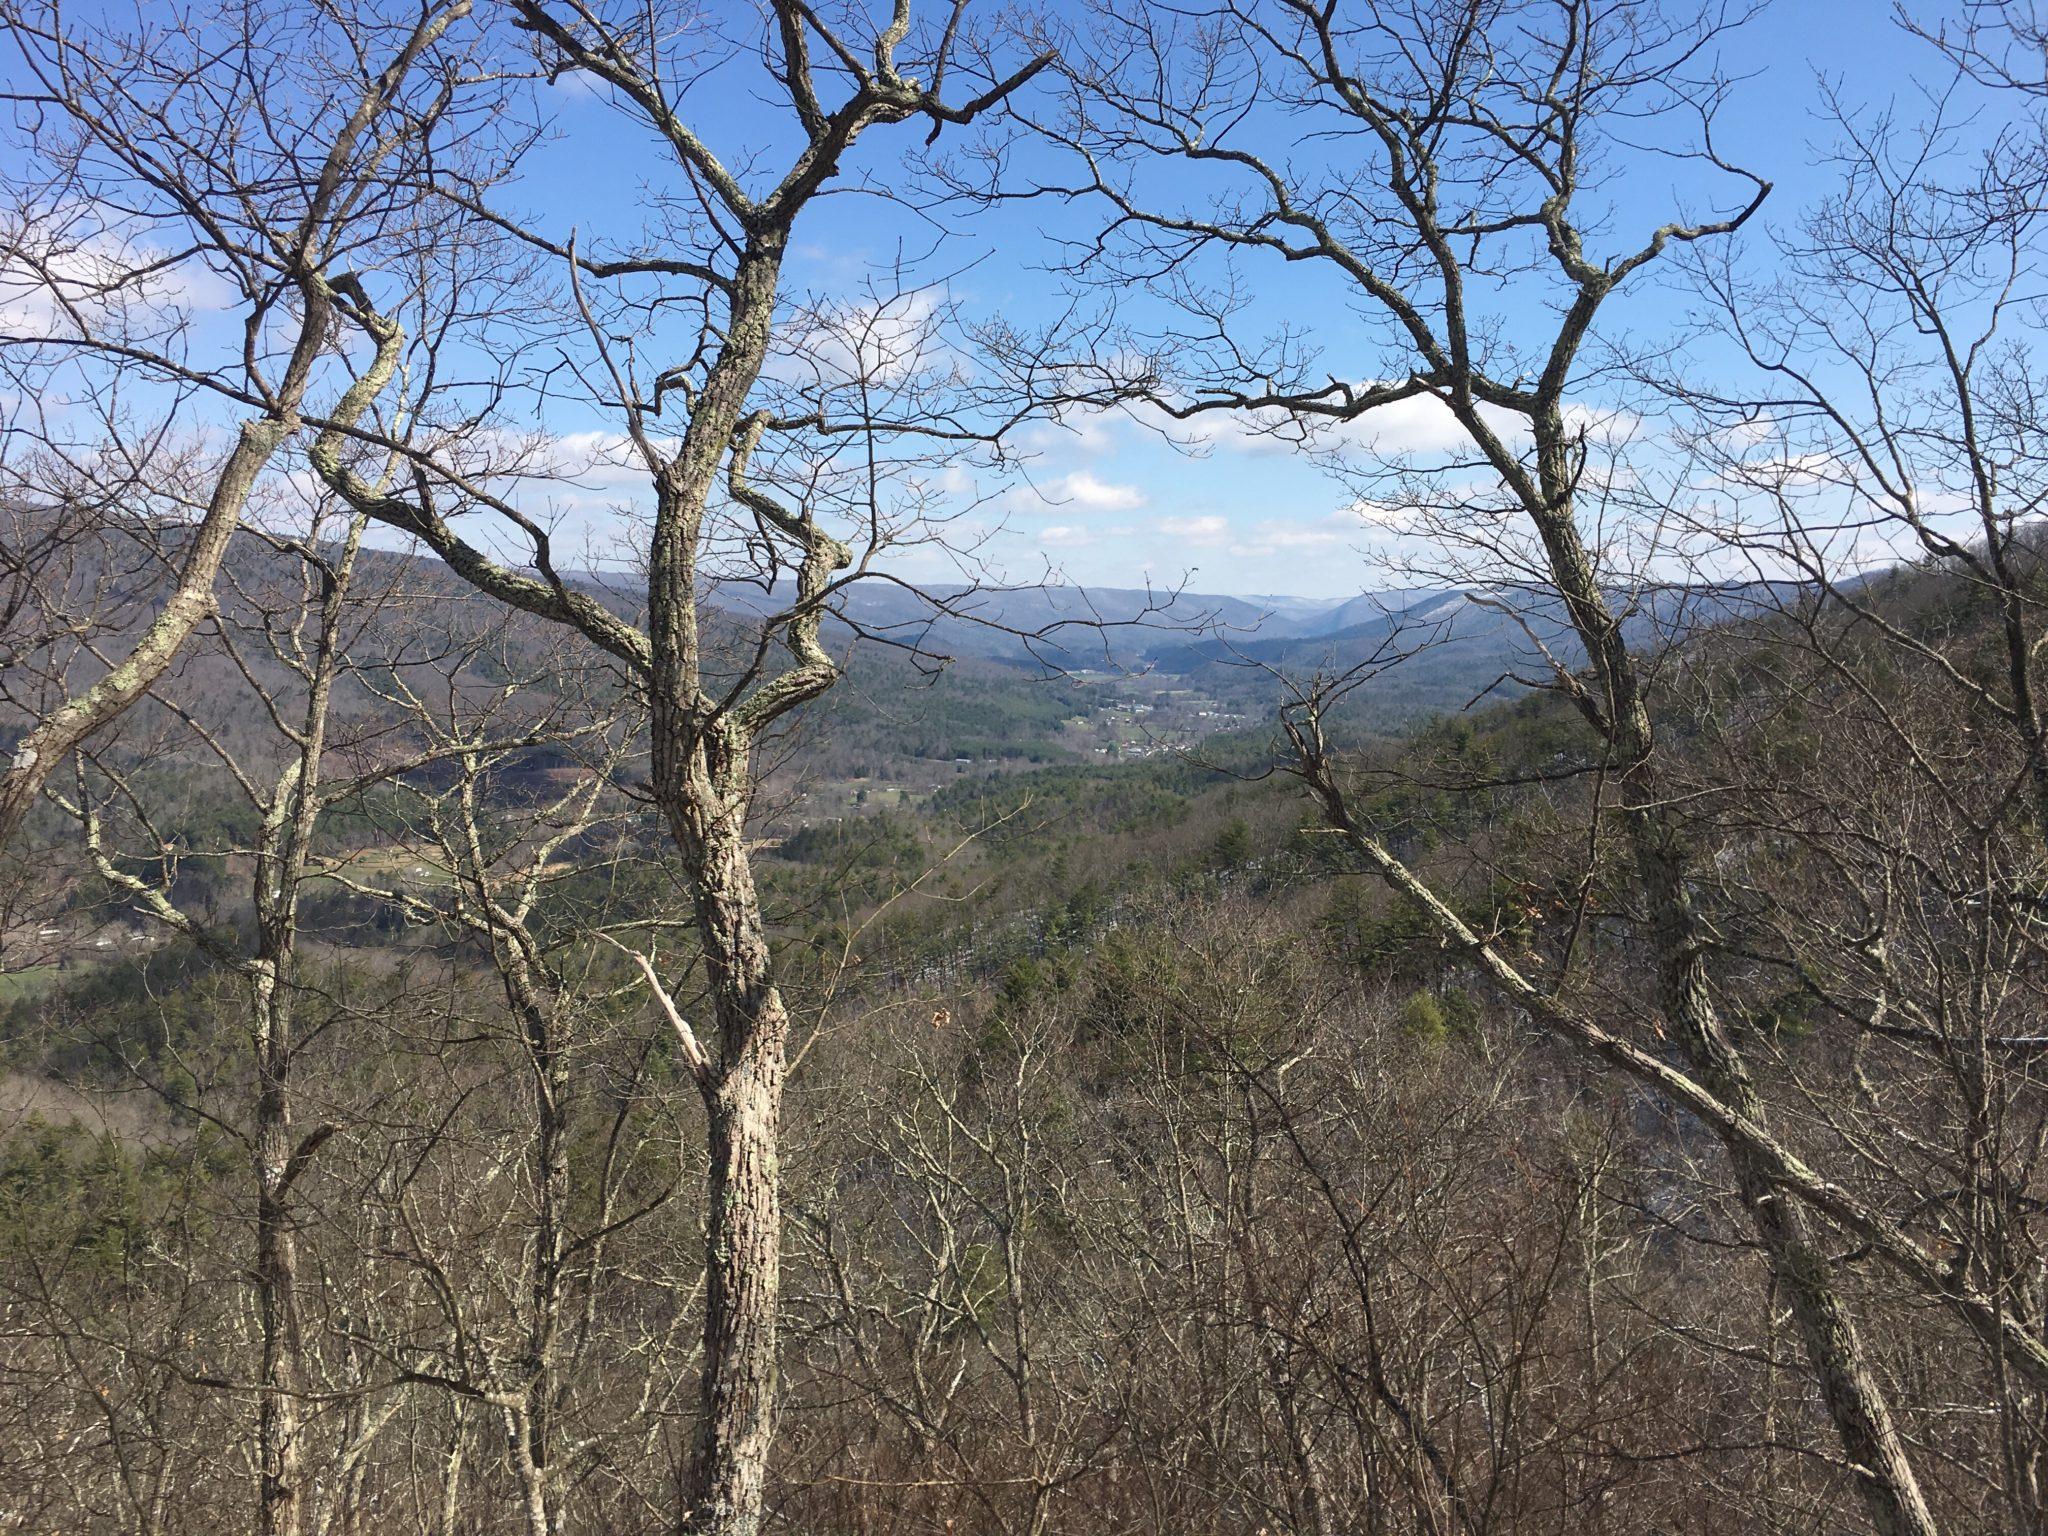 Beautiful views from atop the ridge